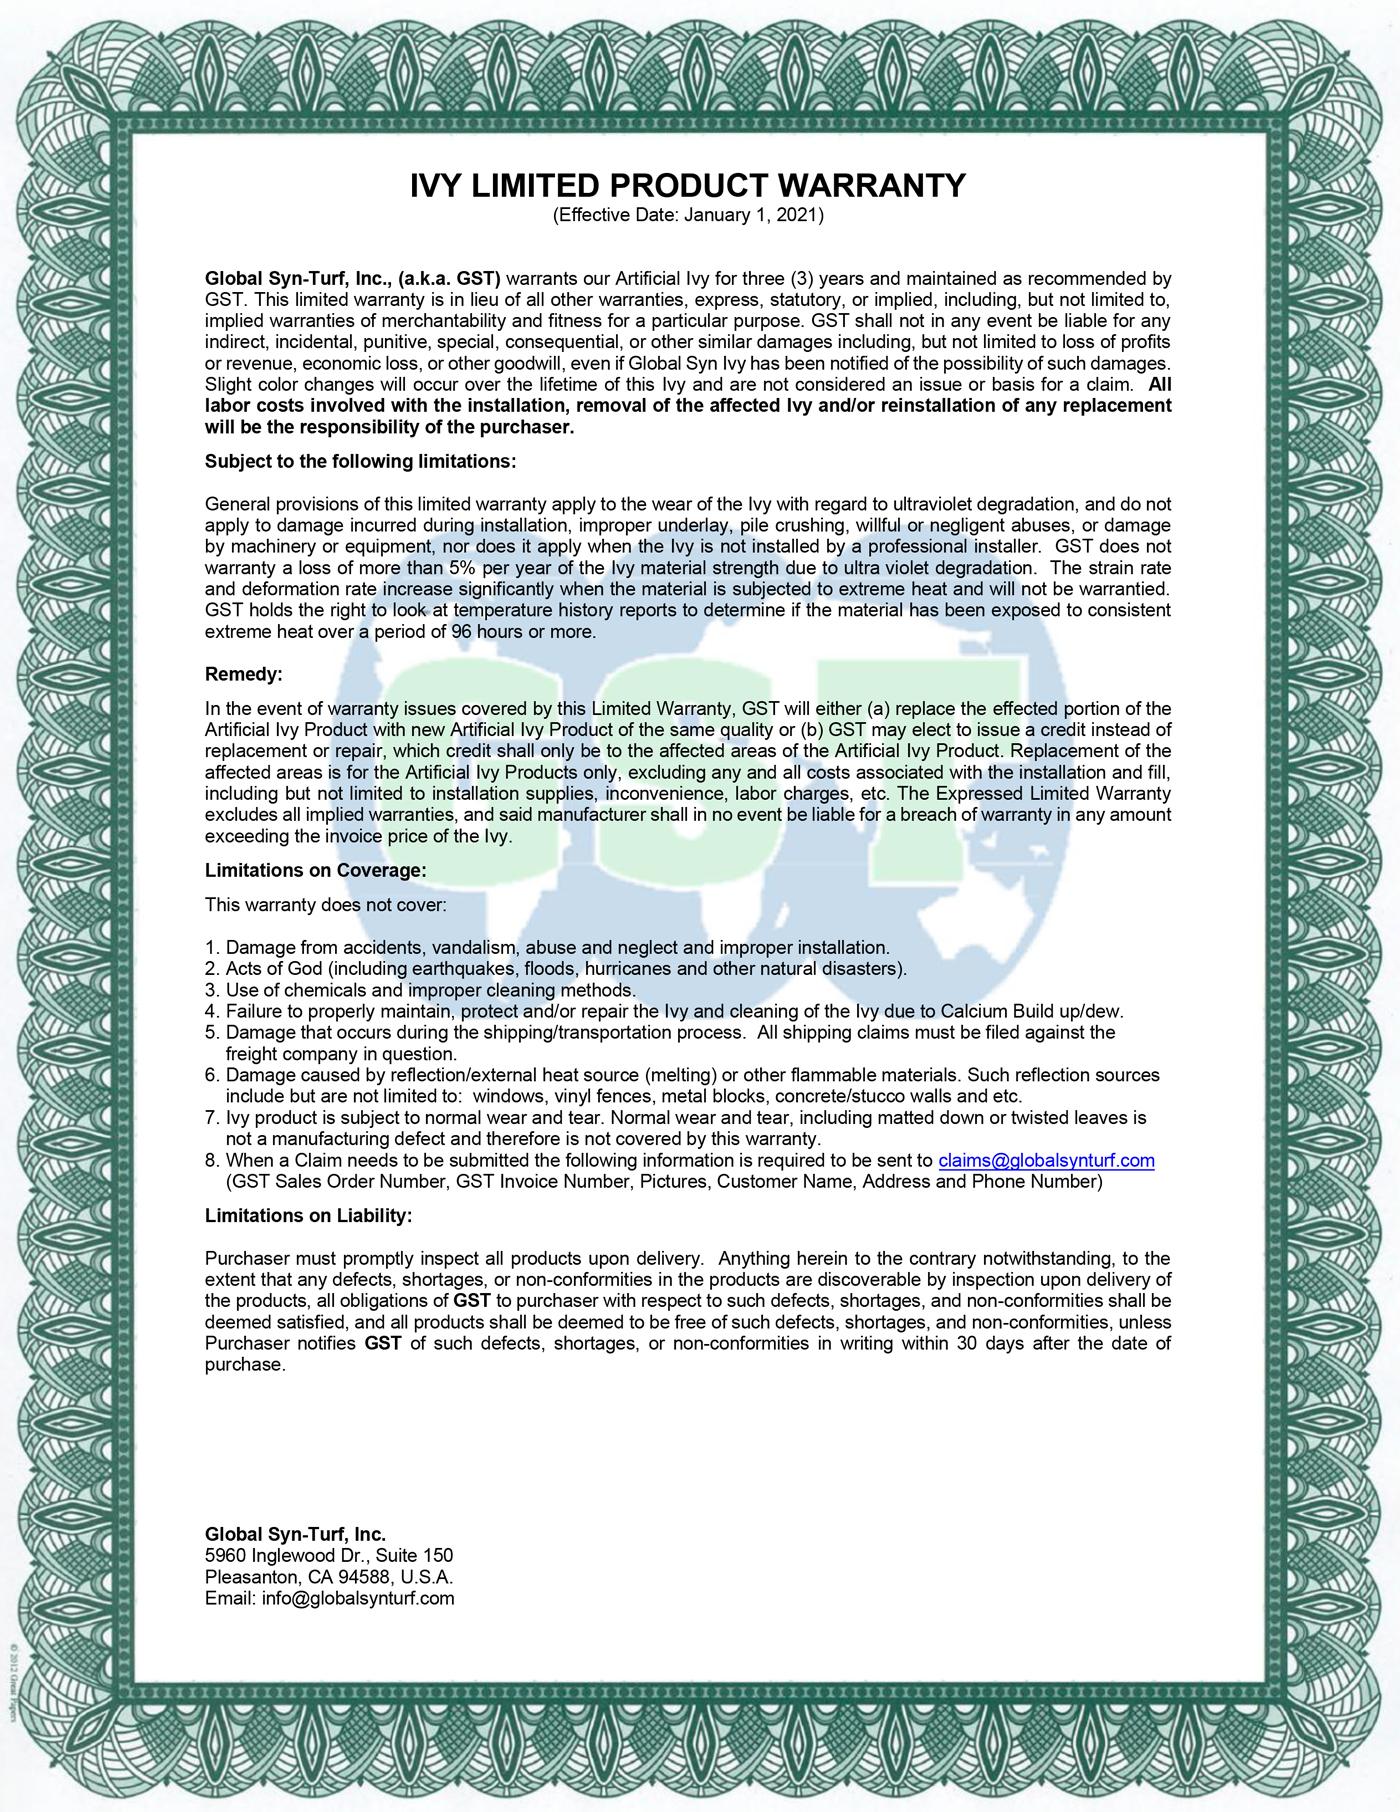 Global Syn-Turf Artificial Ivy Warranty